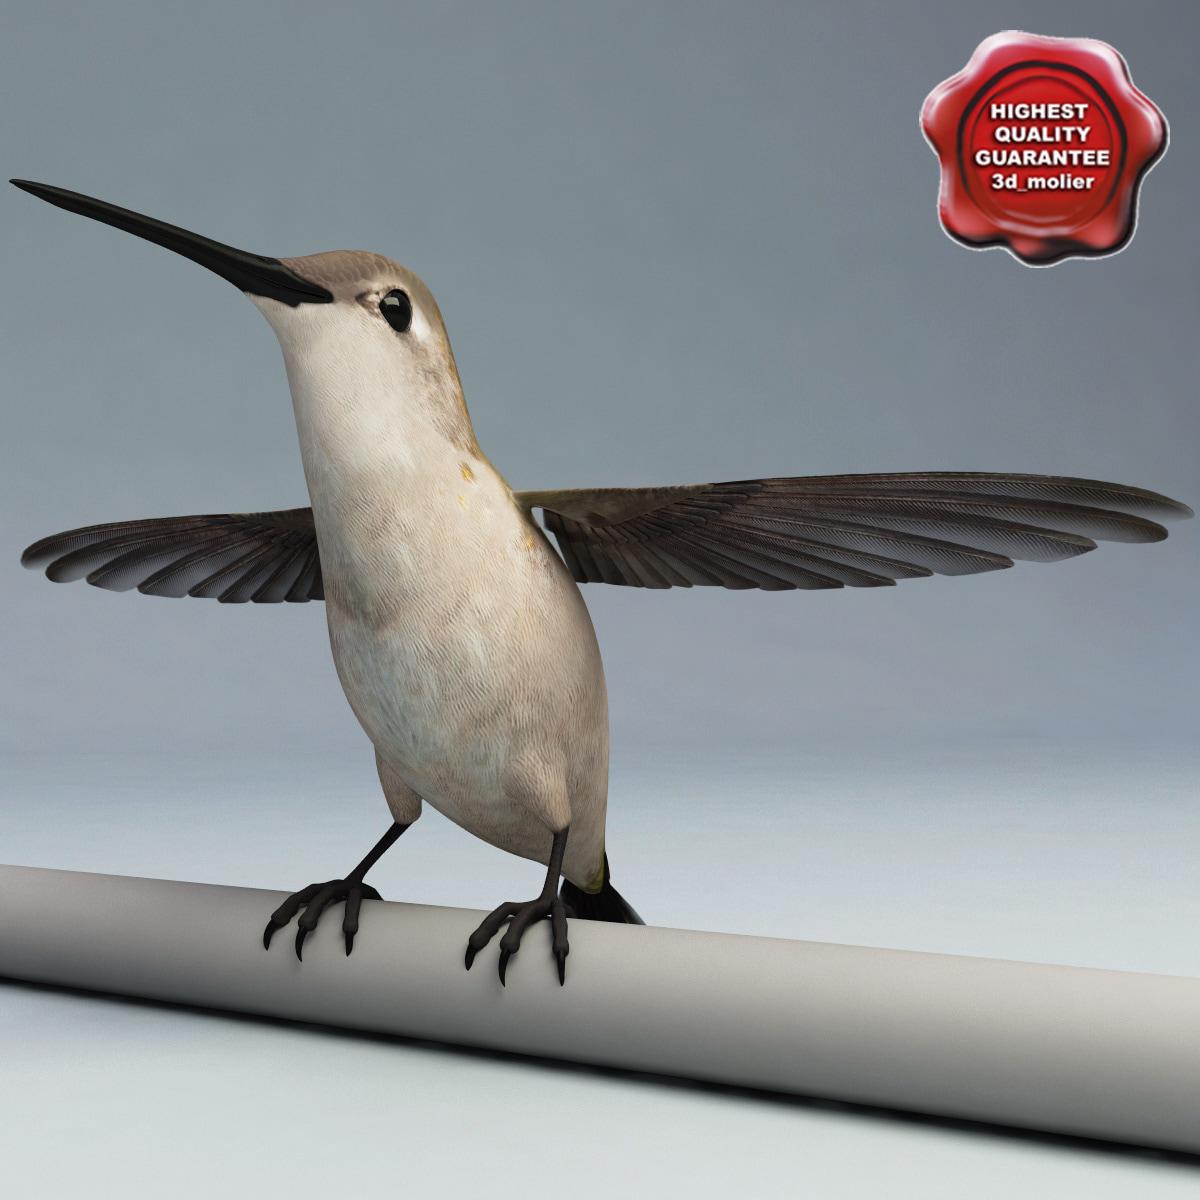 hummingbird pose3 3d max